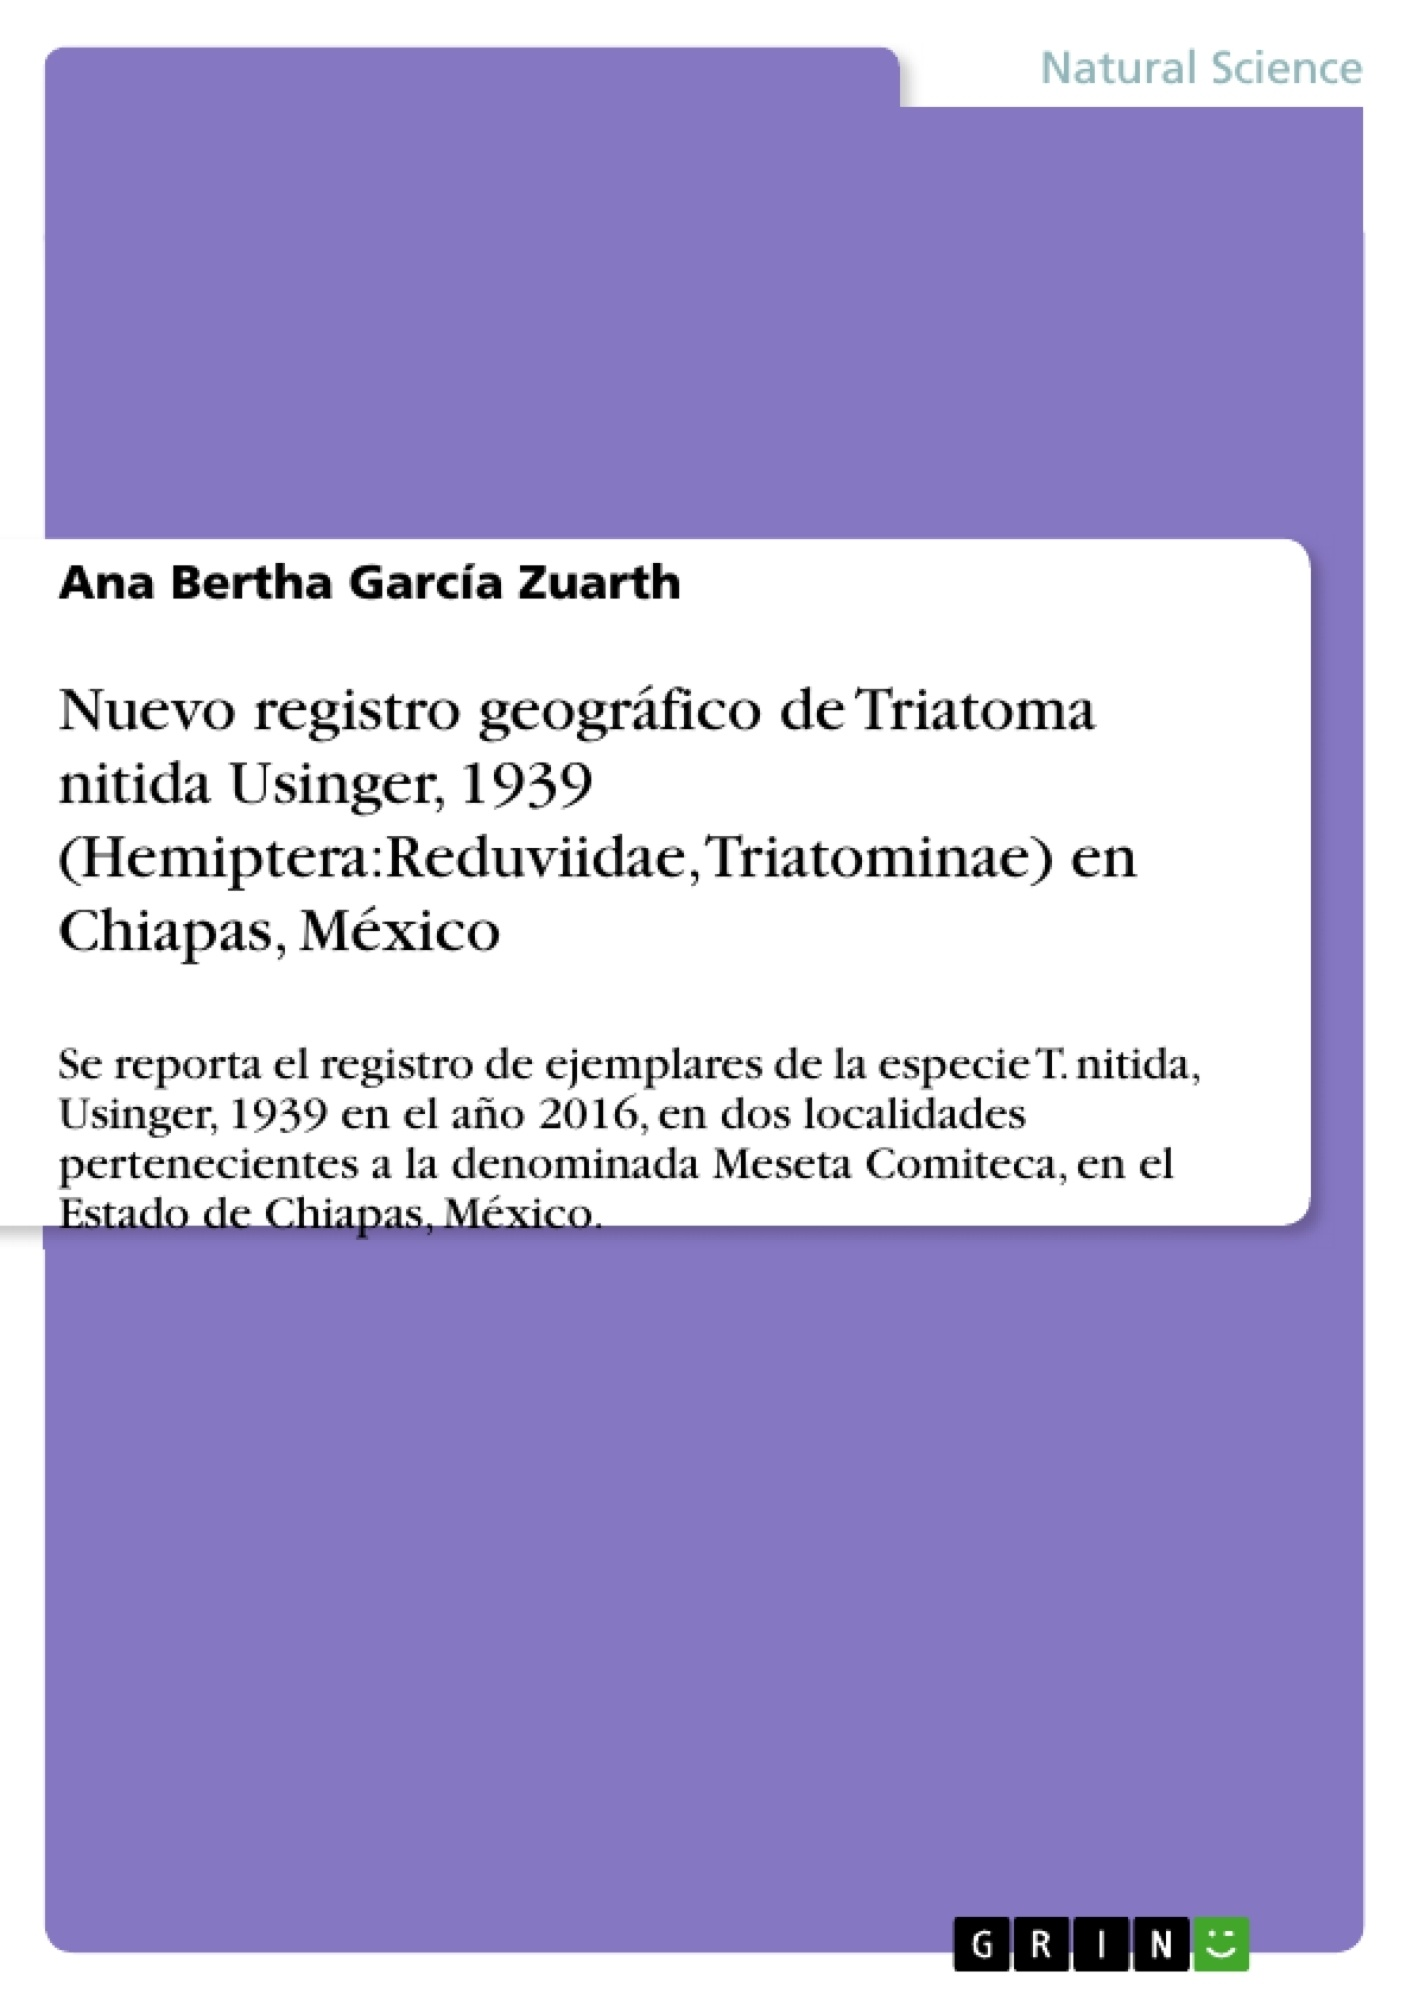 Título: Nuevo registro geográfico de Triatoma nitida Usinger, 1939 (Hemiptera:Reduviidae, Triatominae) en Chiapas, México